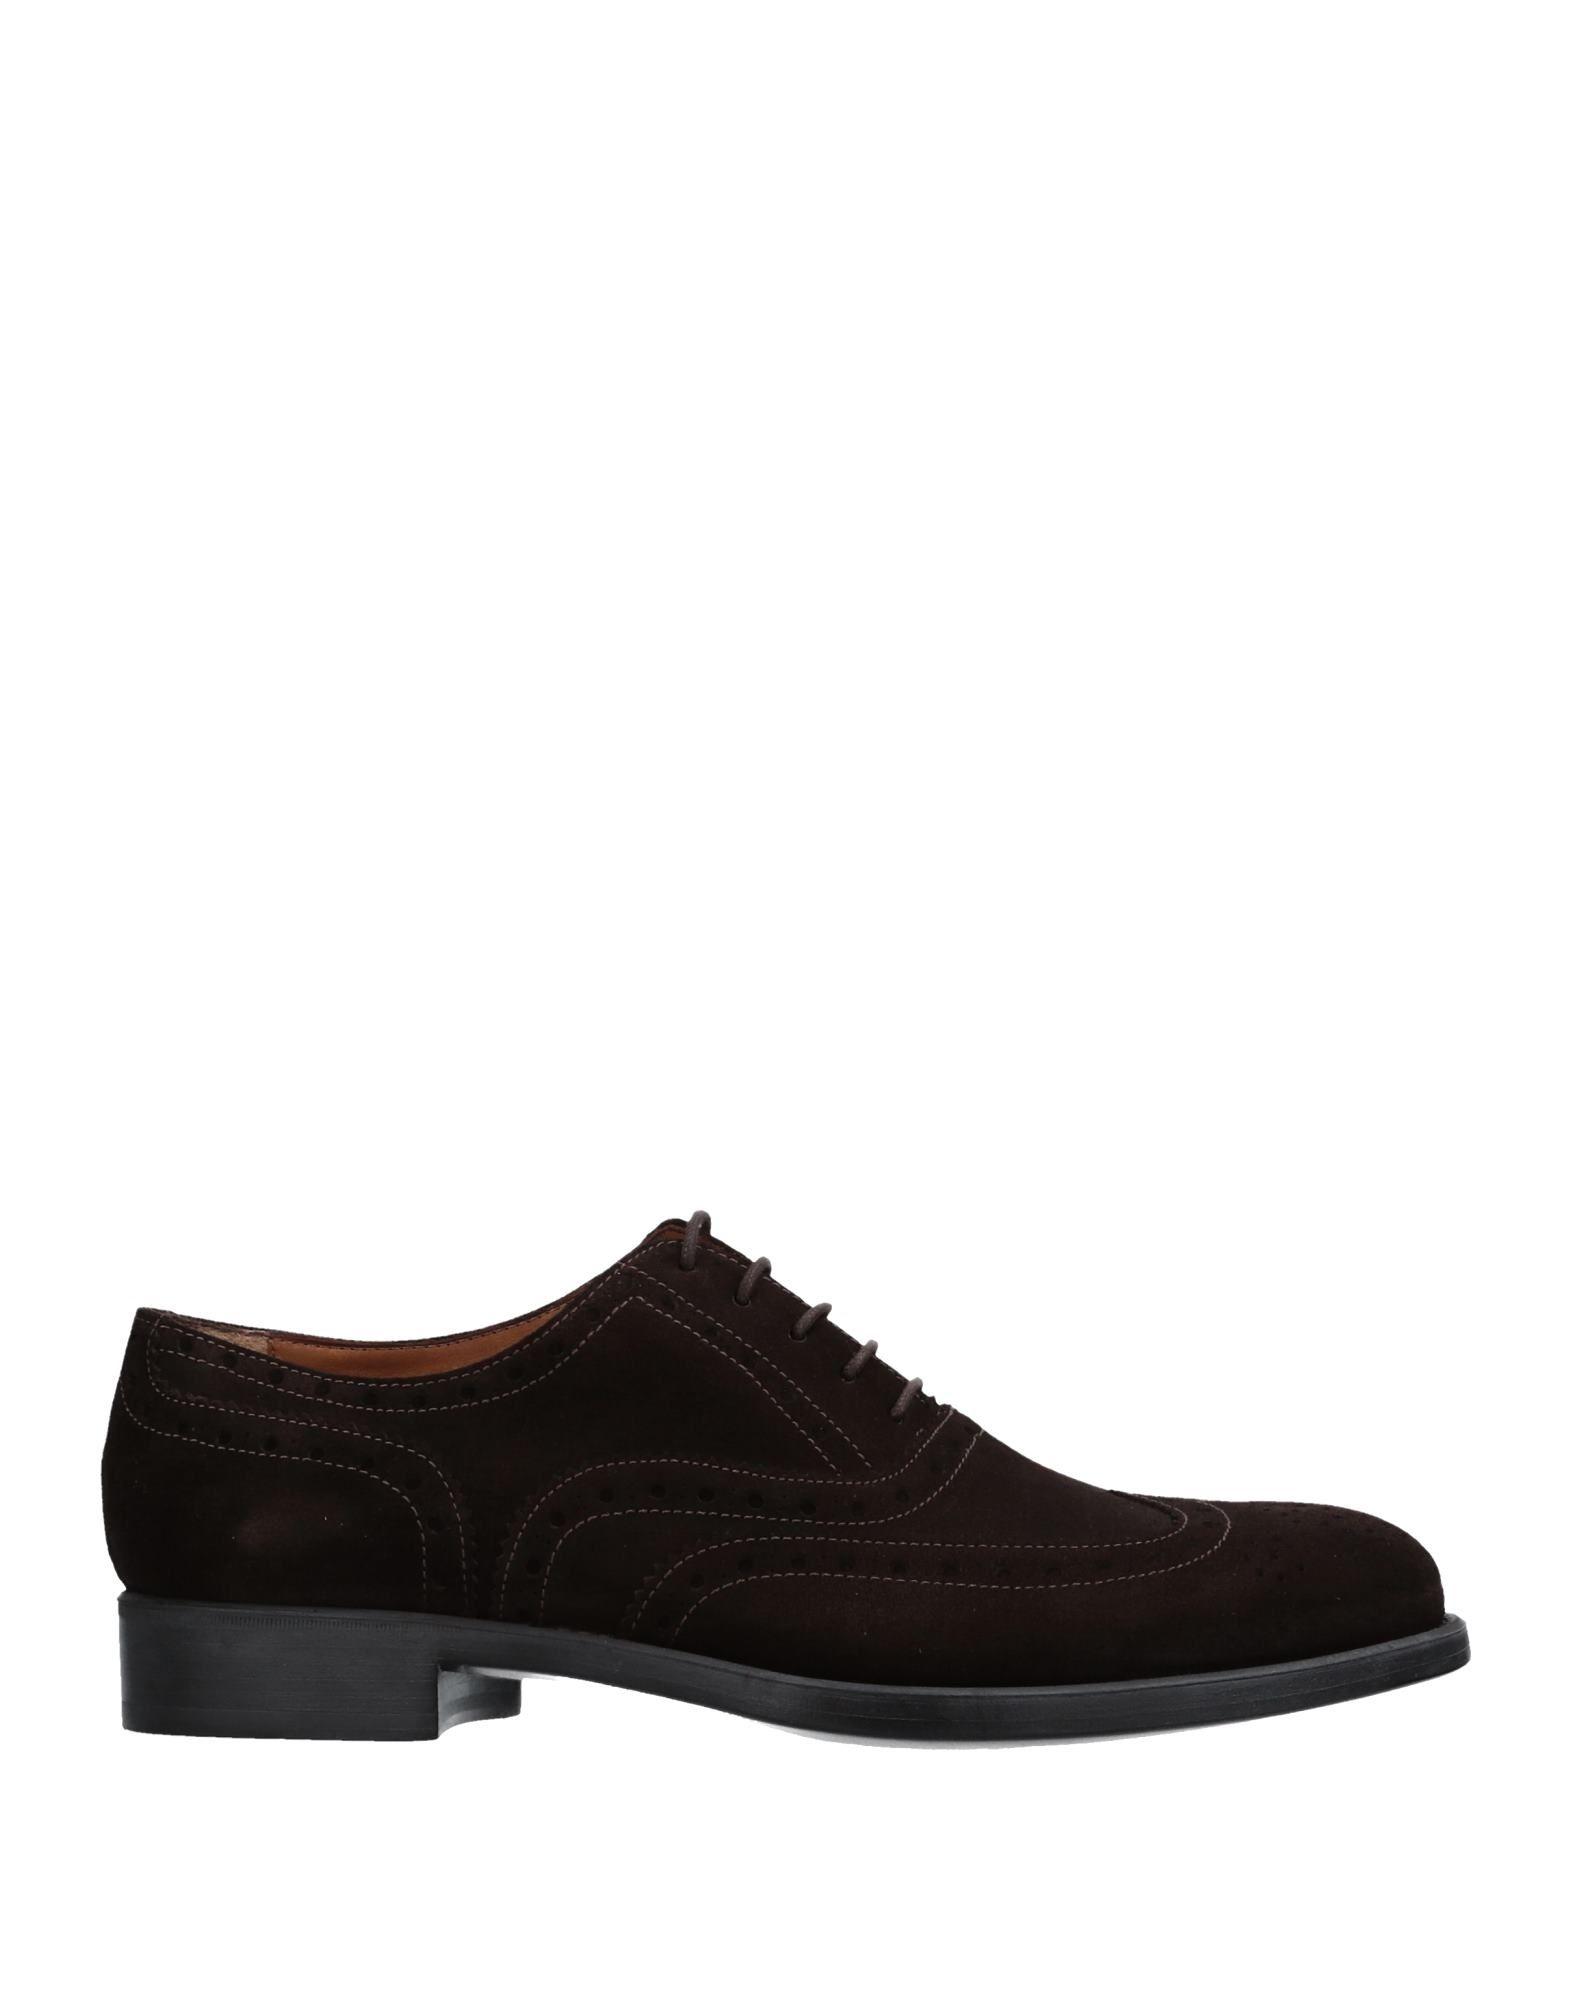 Rabatt echte Schuhe Wexford Schnürschuhe Herren  11508030BL